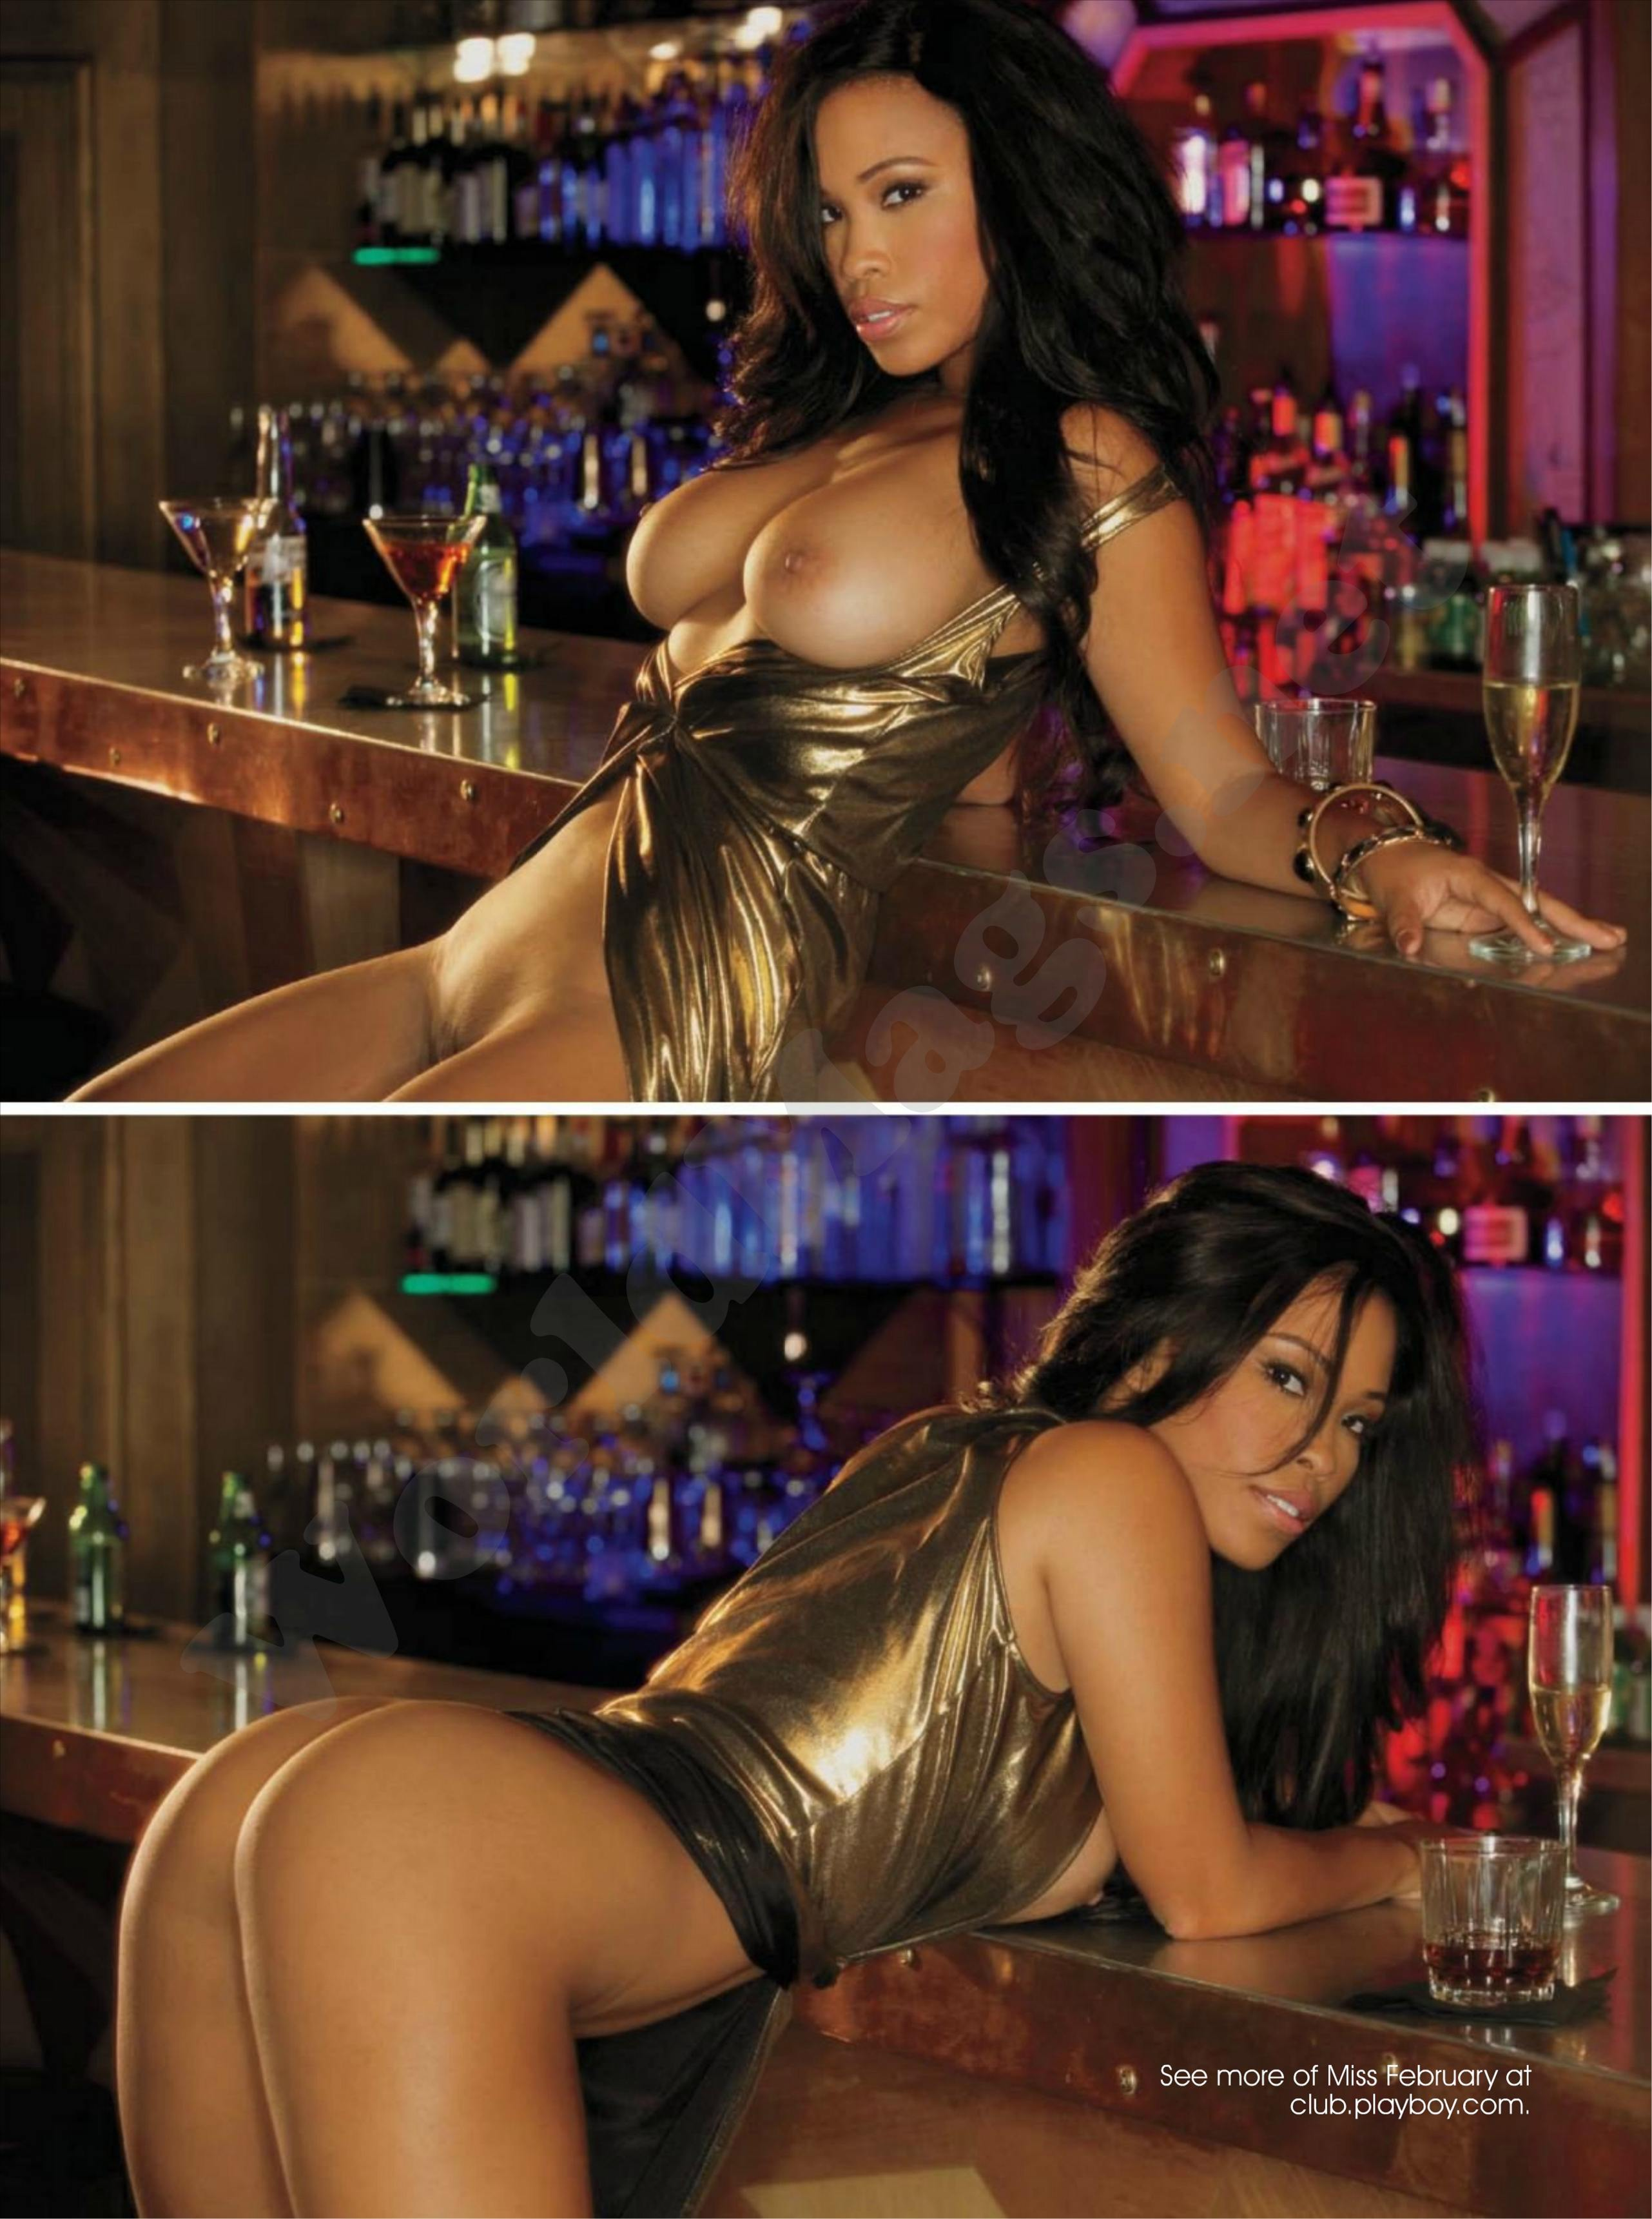 Leola Bell - Playboy January-February 2012 (1-2 2012) USA